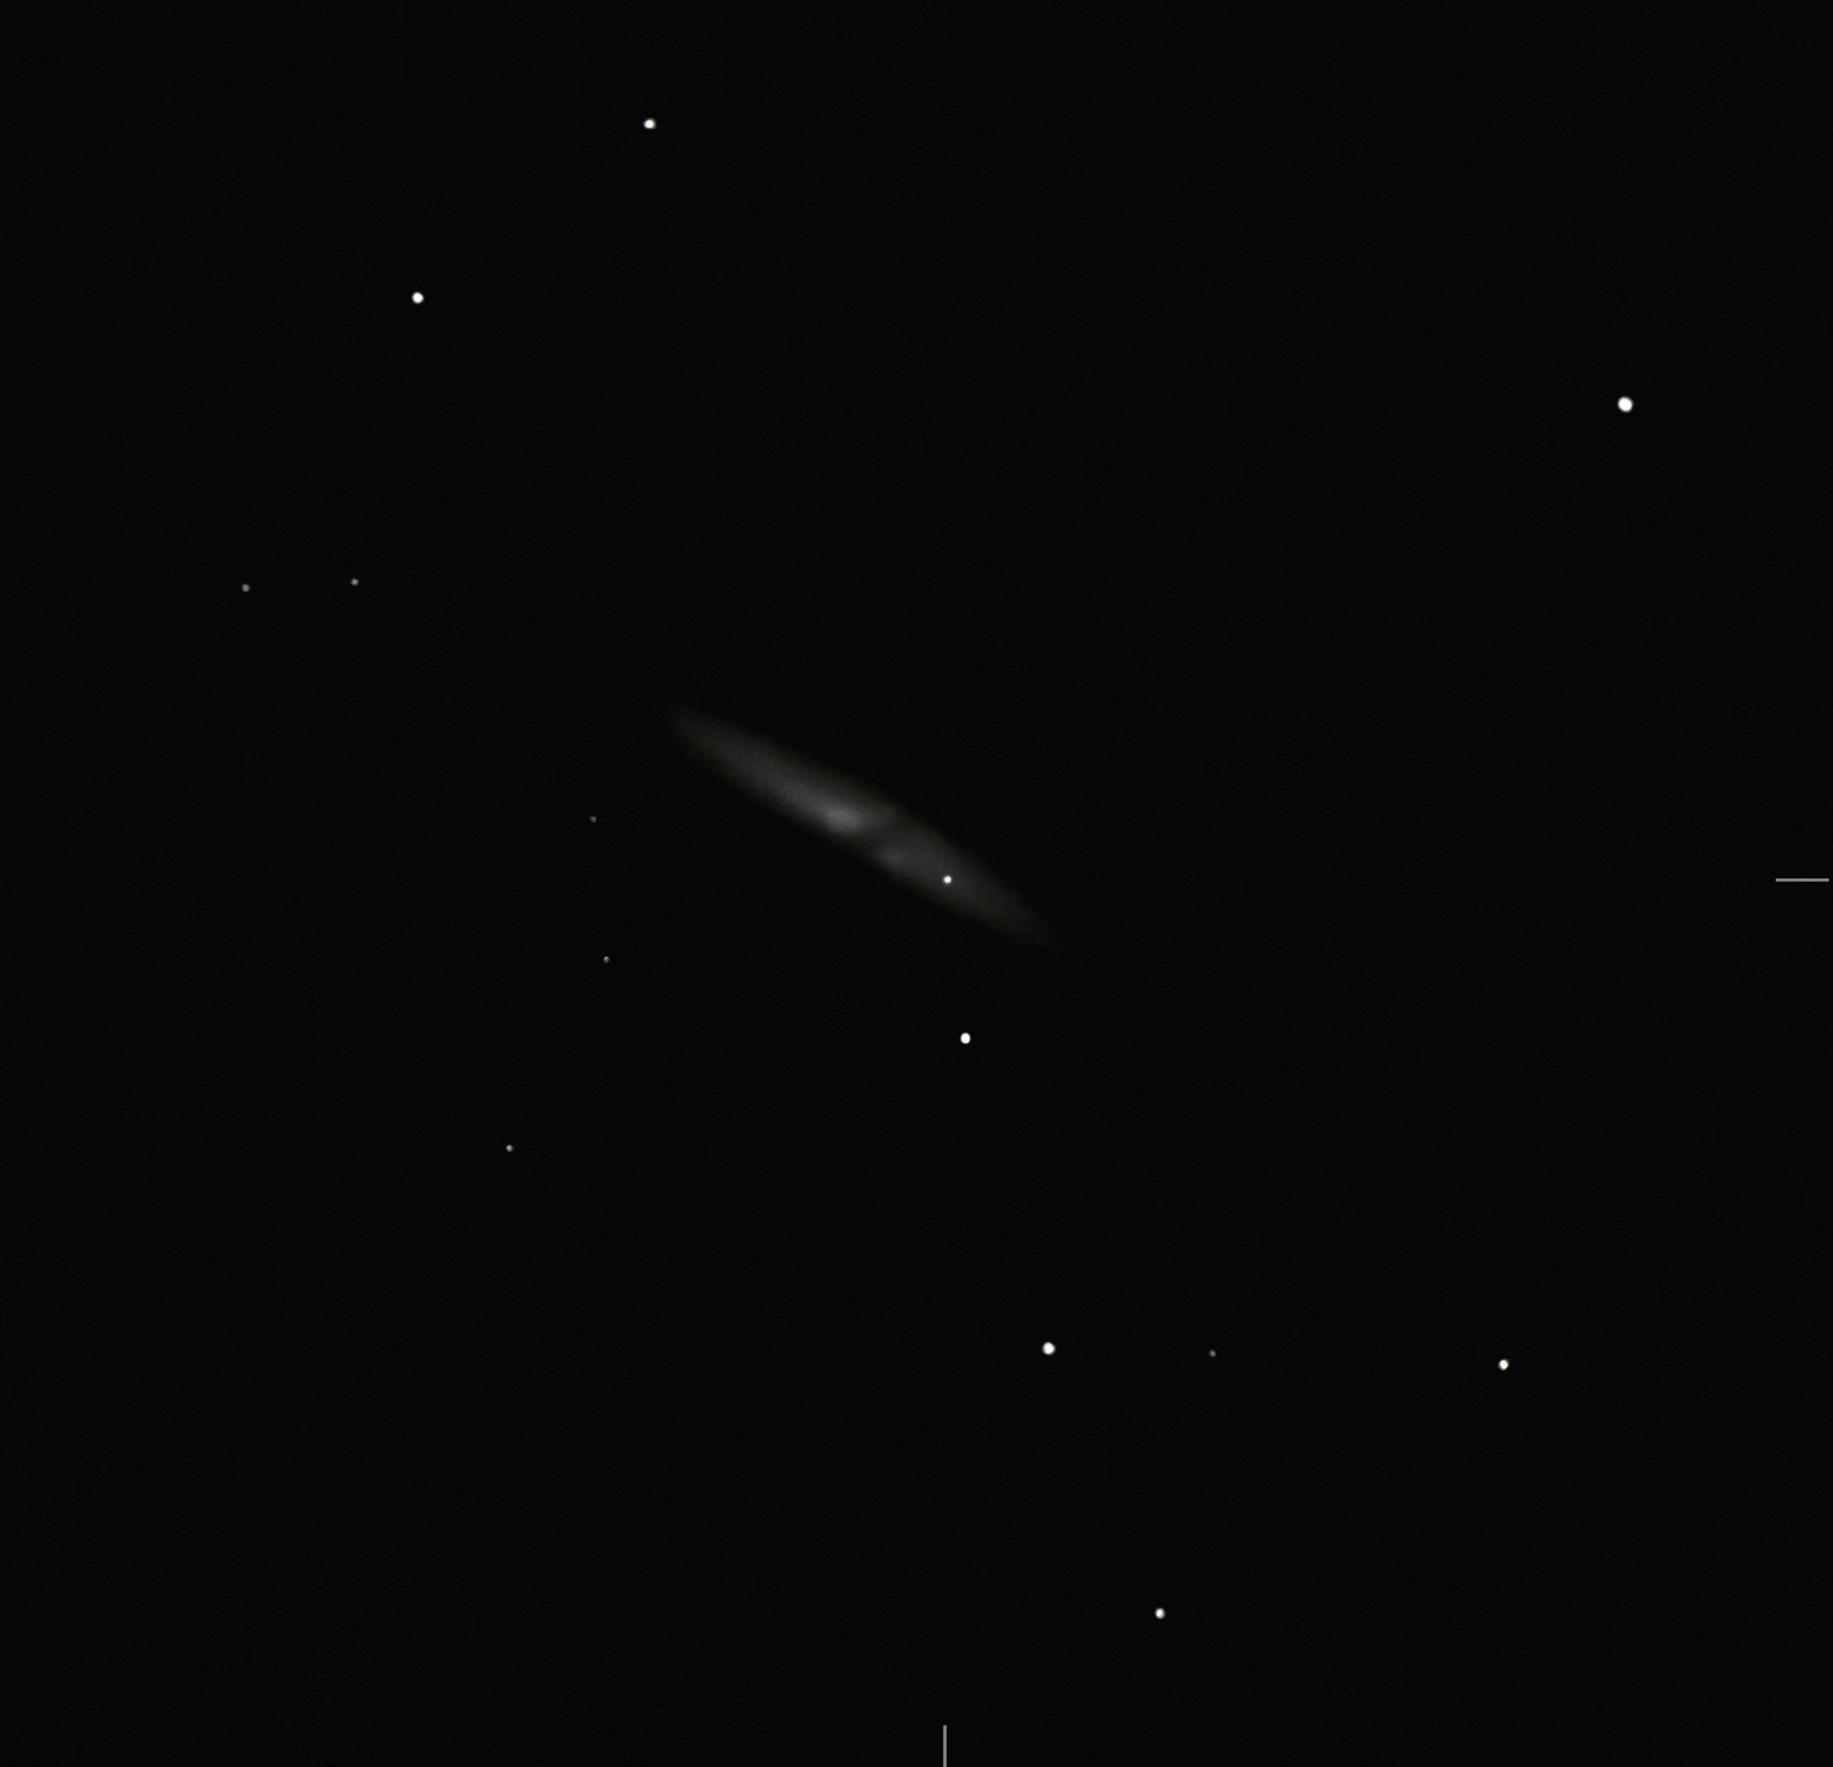 M82 galaxy and SN 2014J